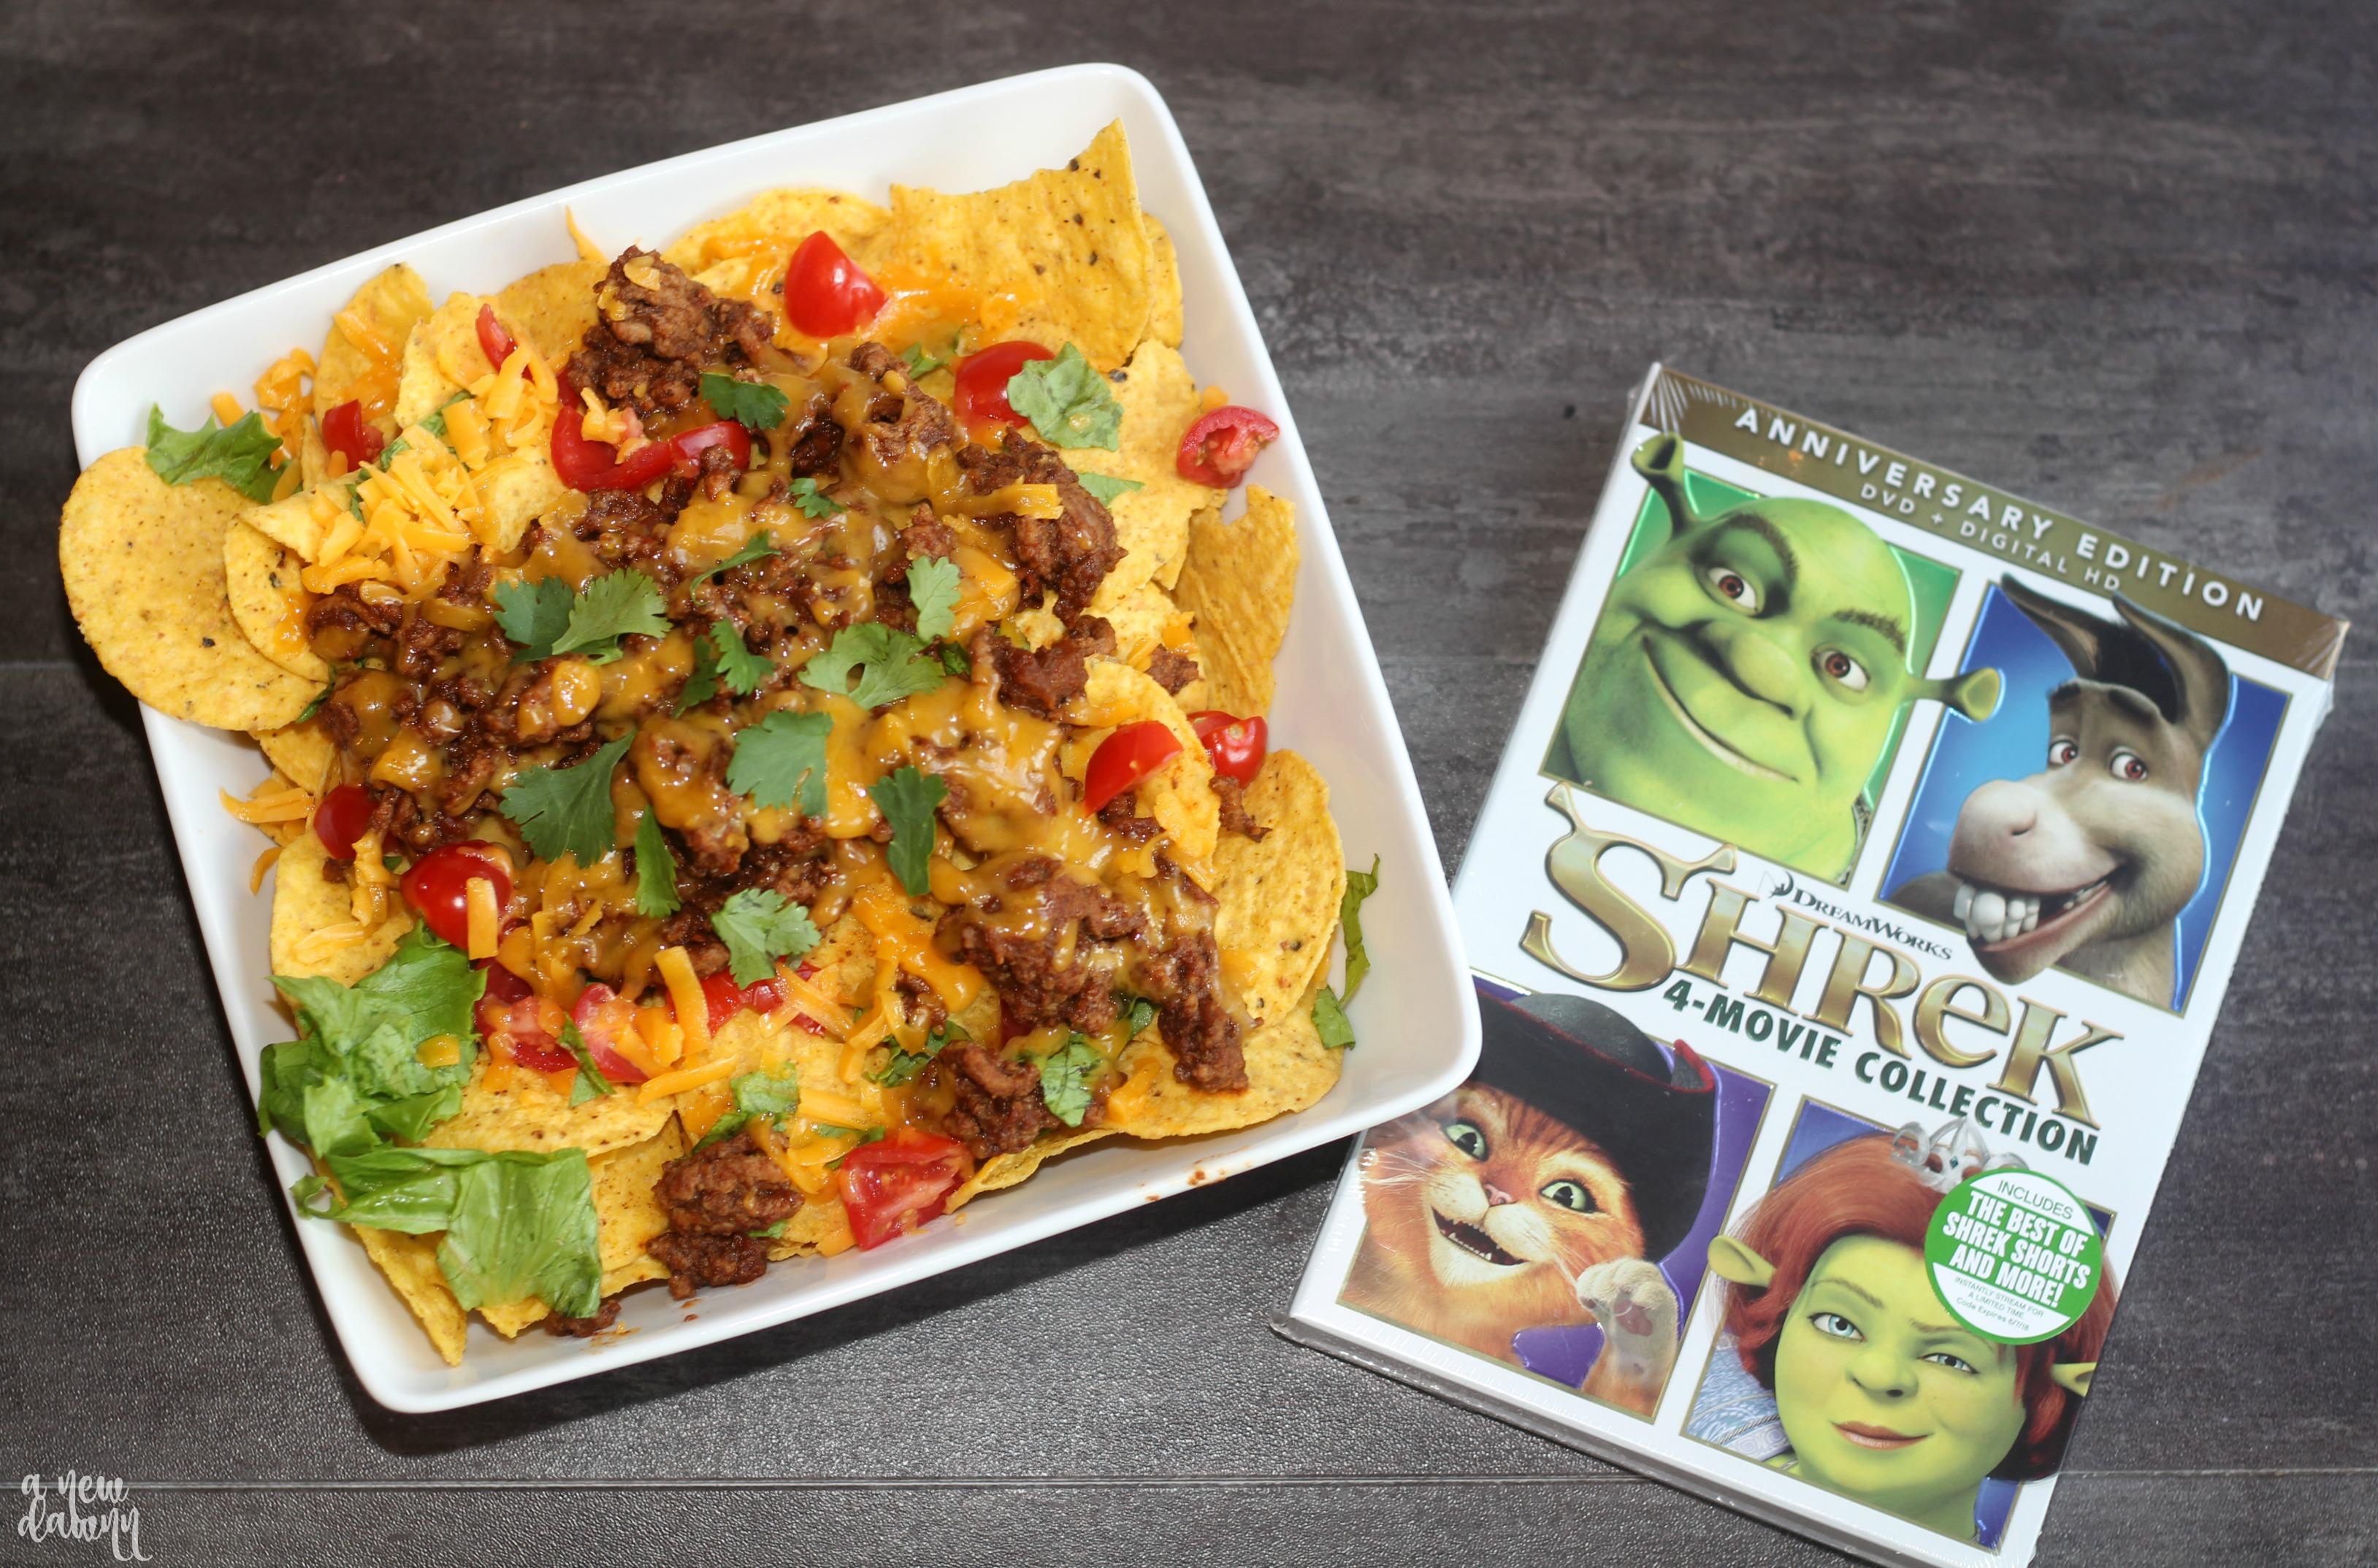 shrek-movie-nachos